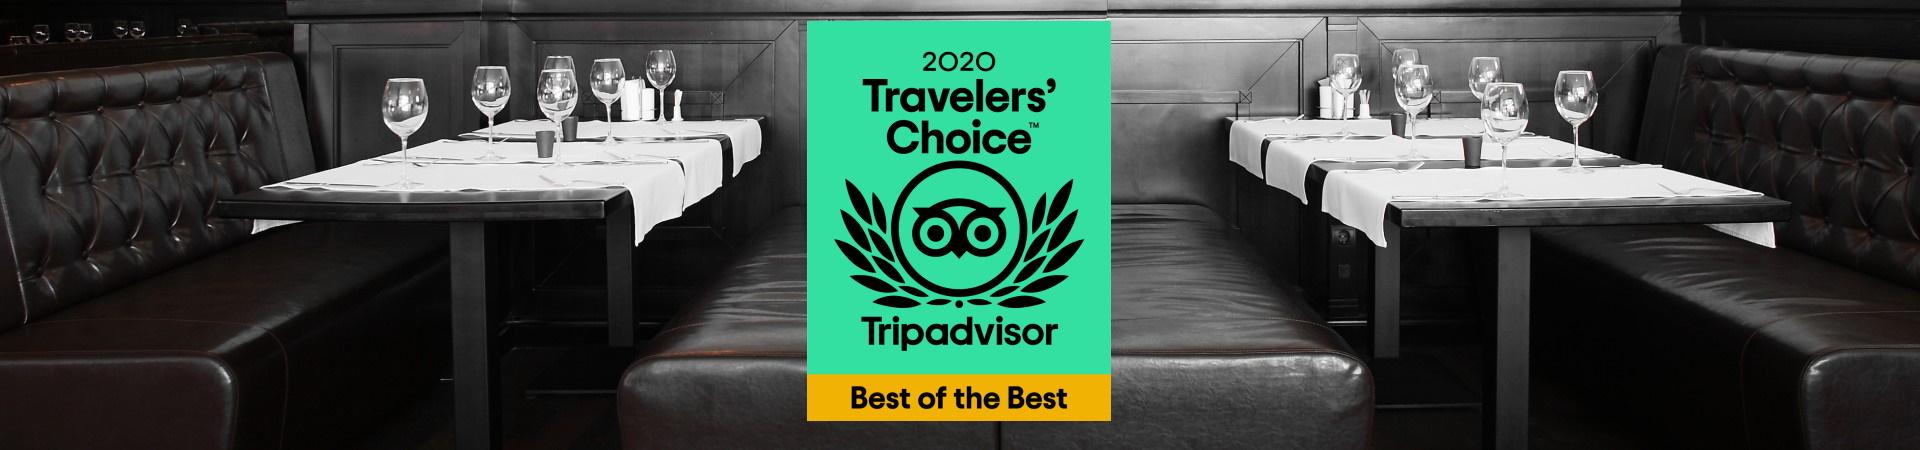 Tripadvisor award widget